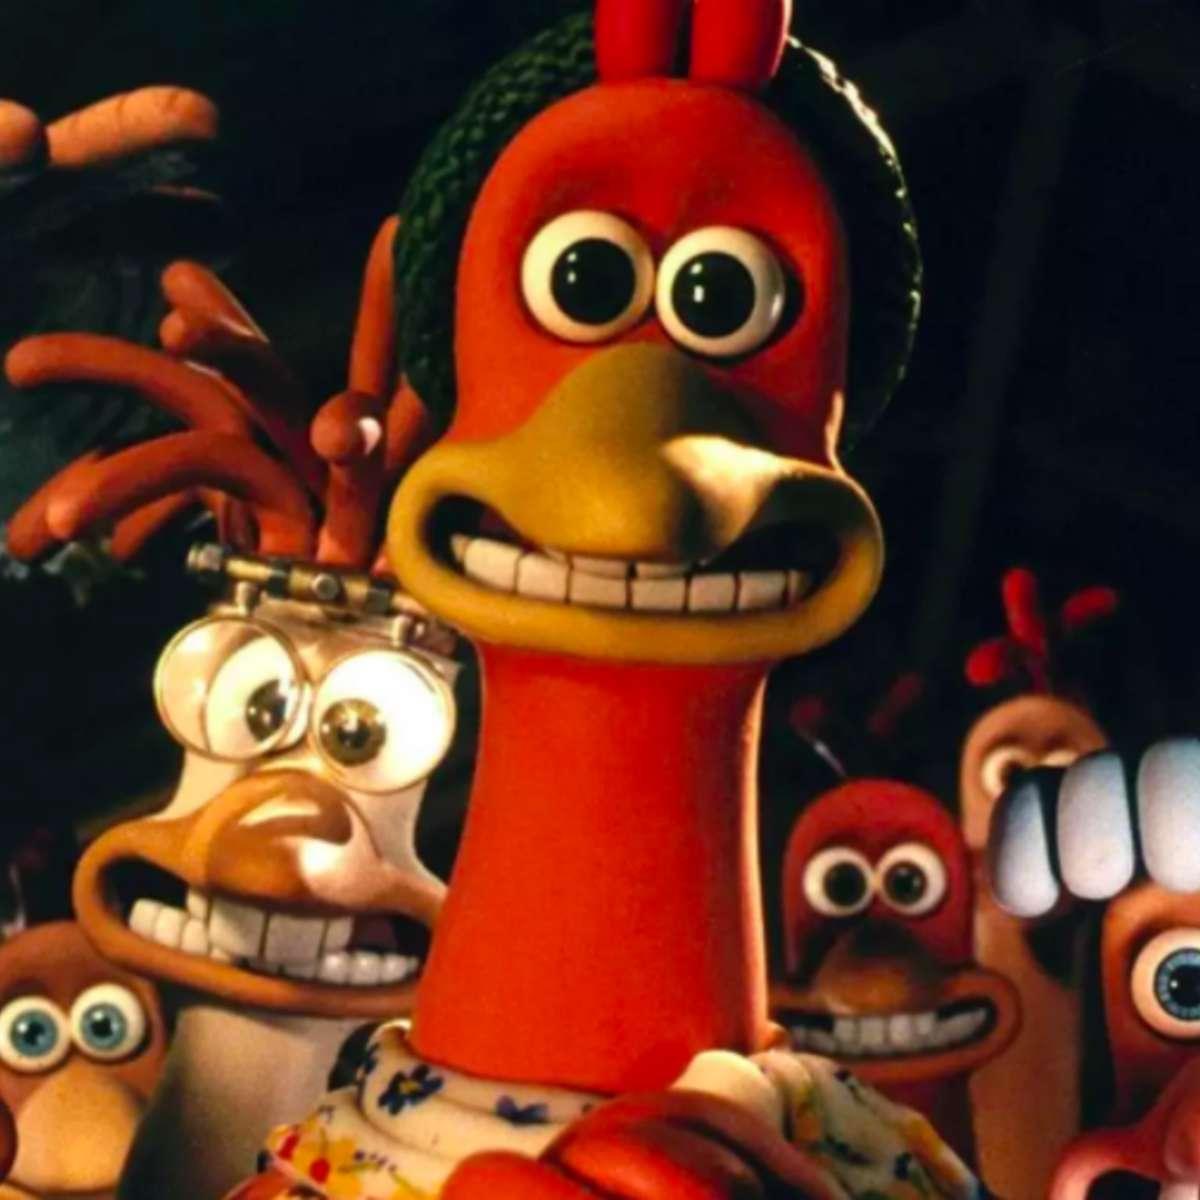 Aardman Animations, DreamWorks Studios, DreamWorks Animation